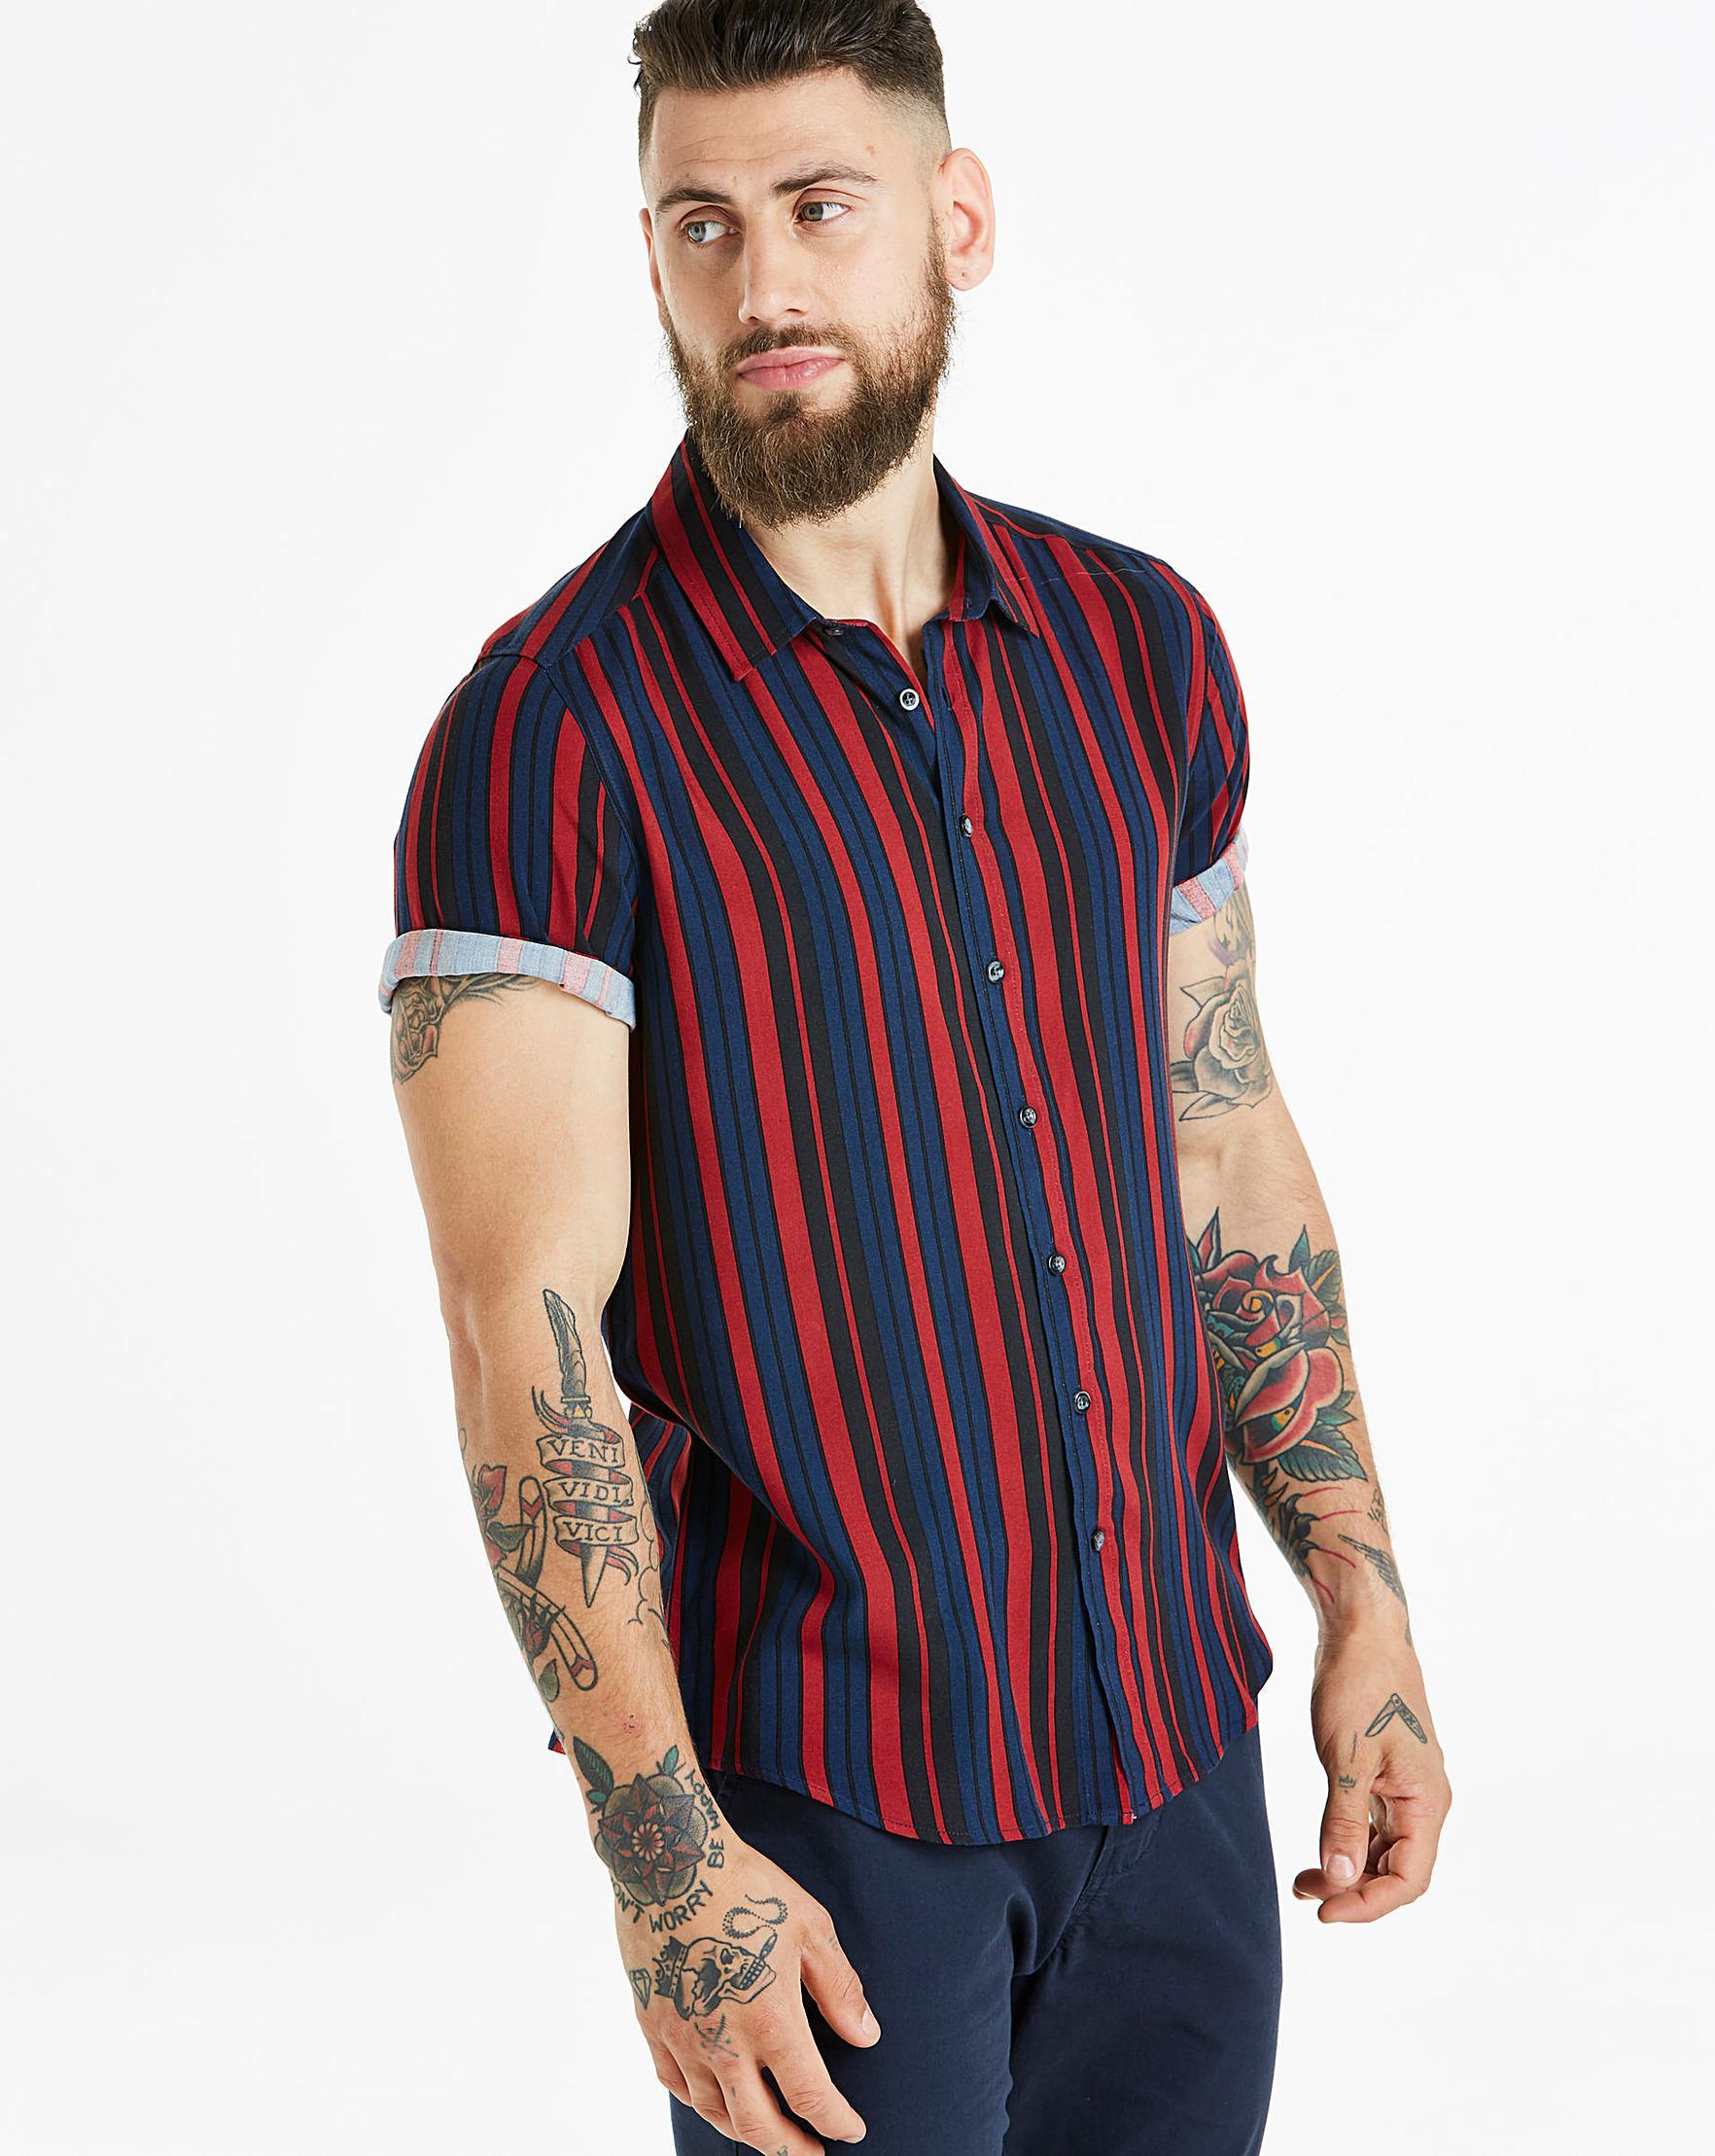 Mens Stripe Shirt Short Sleeve Jacamo